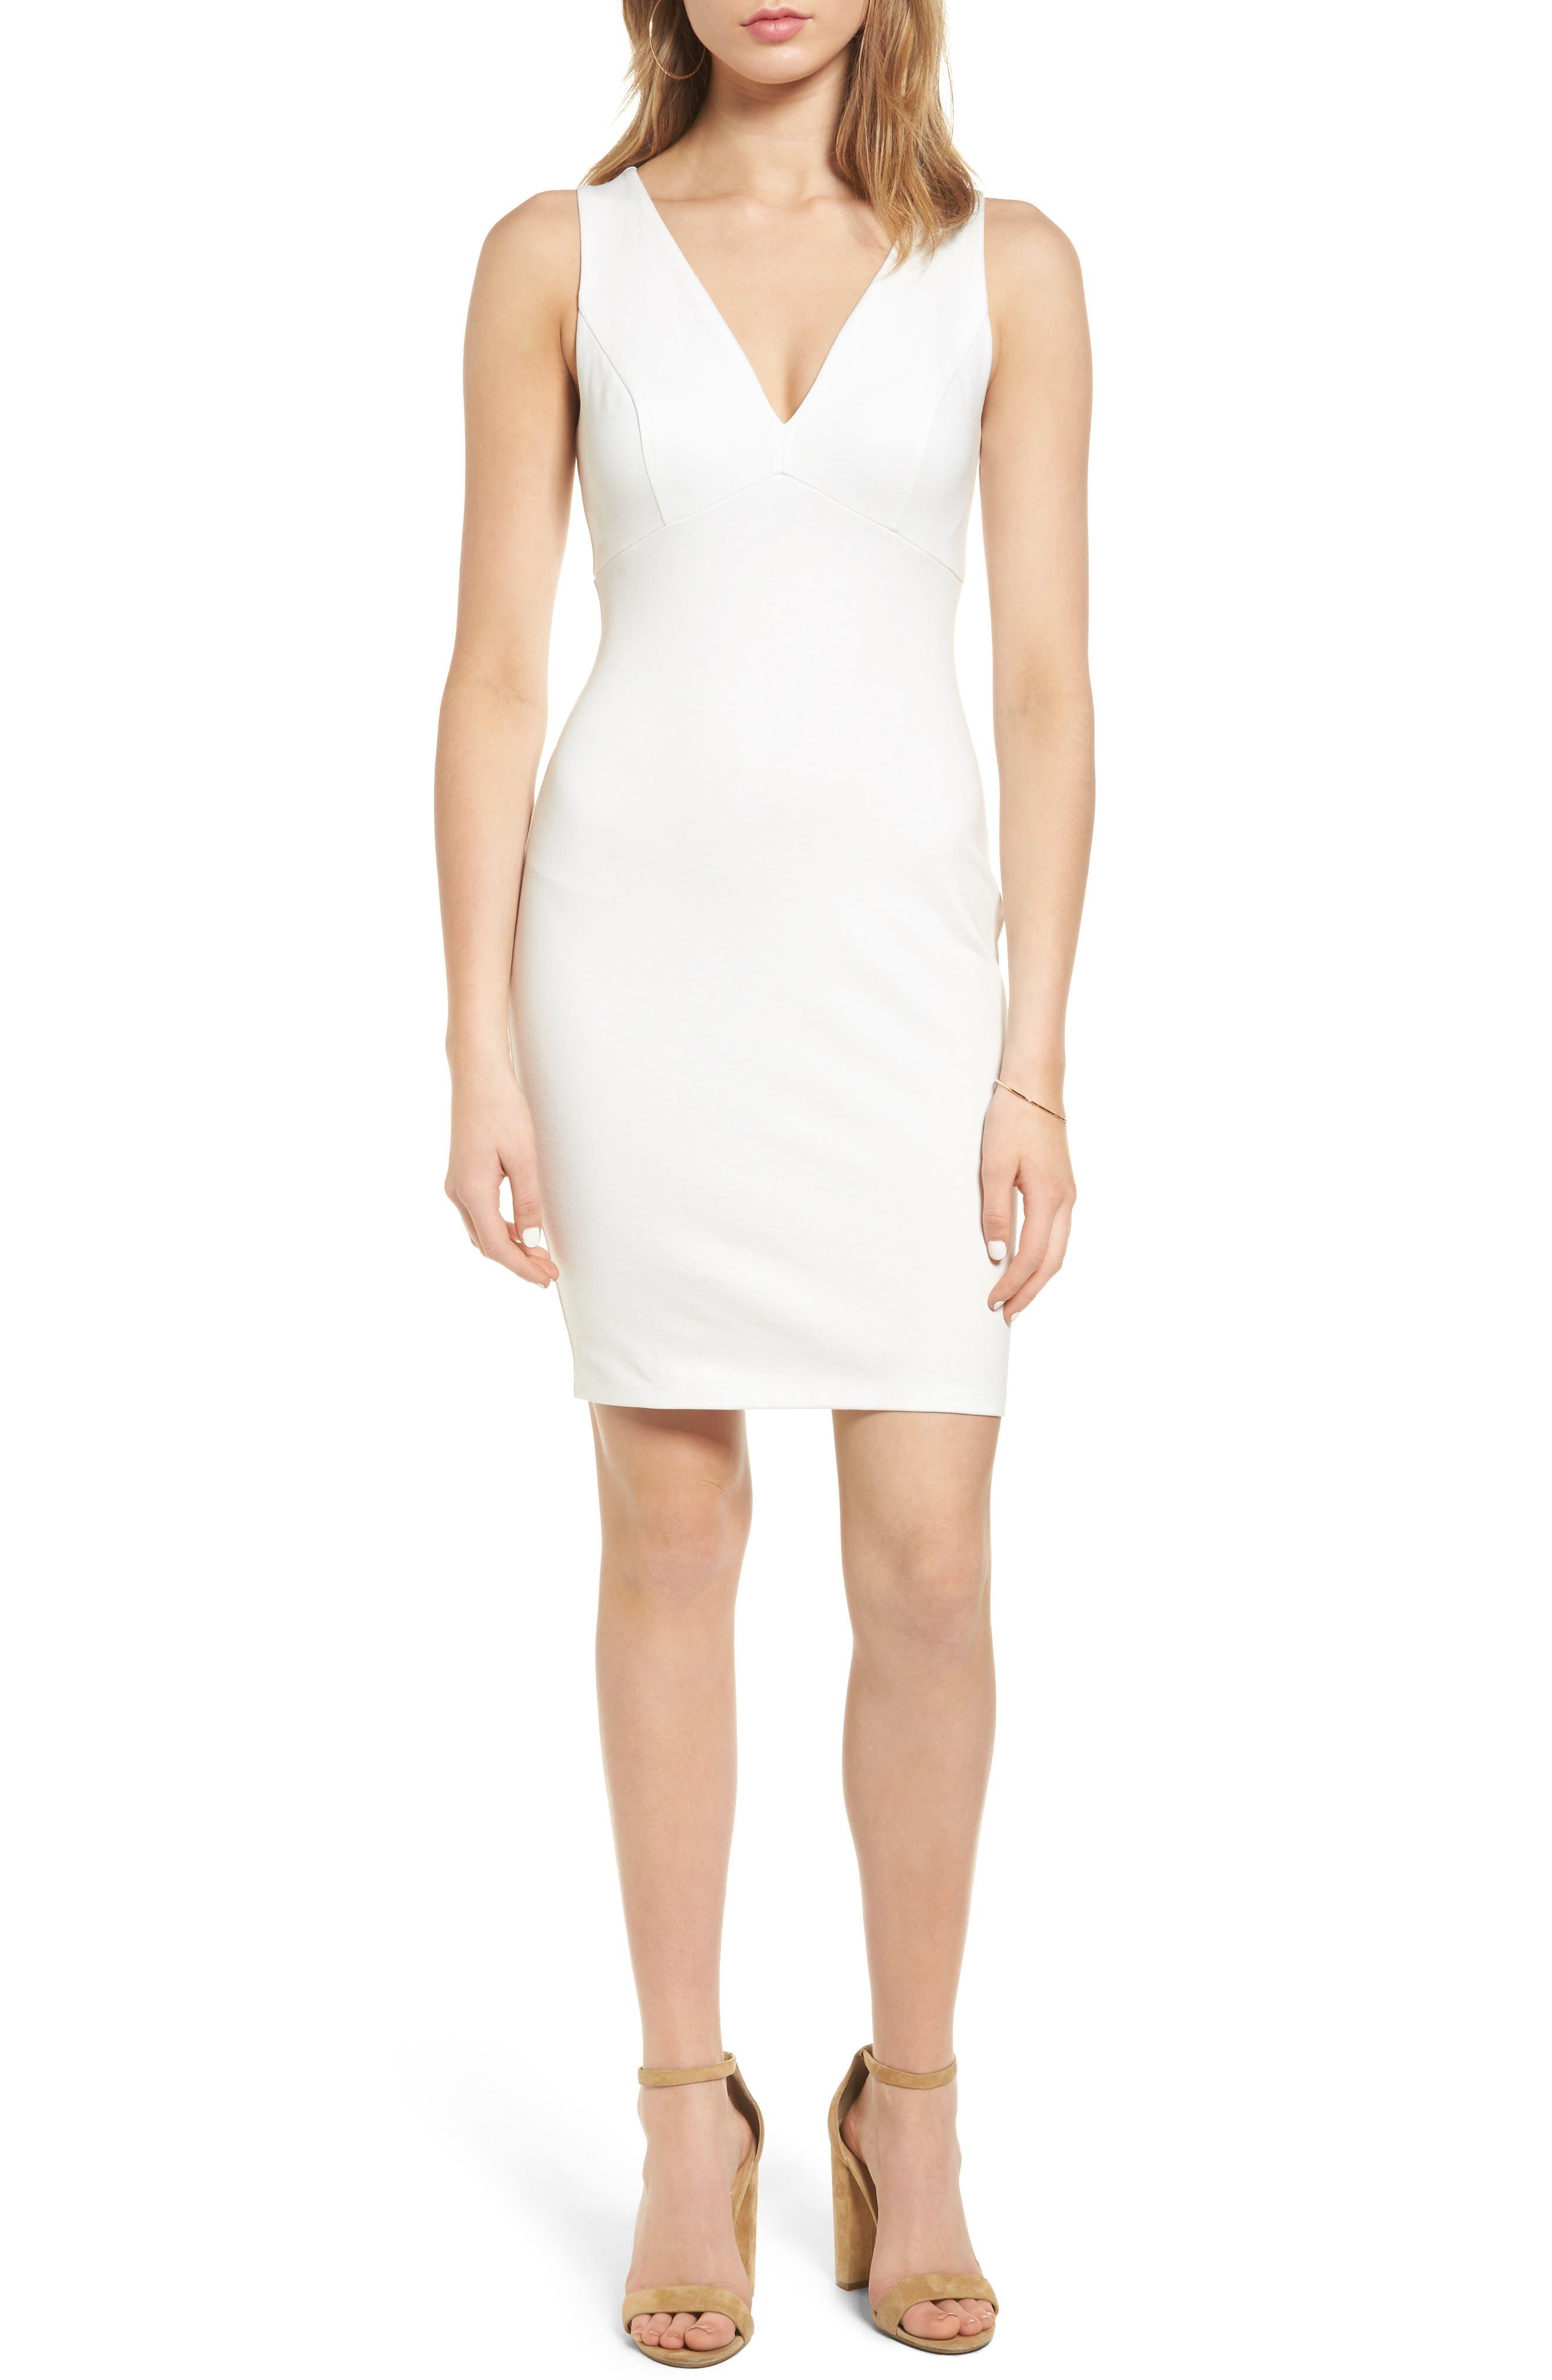 Soprano Cross Back Body-Con Dress